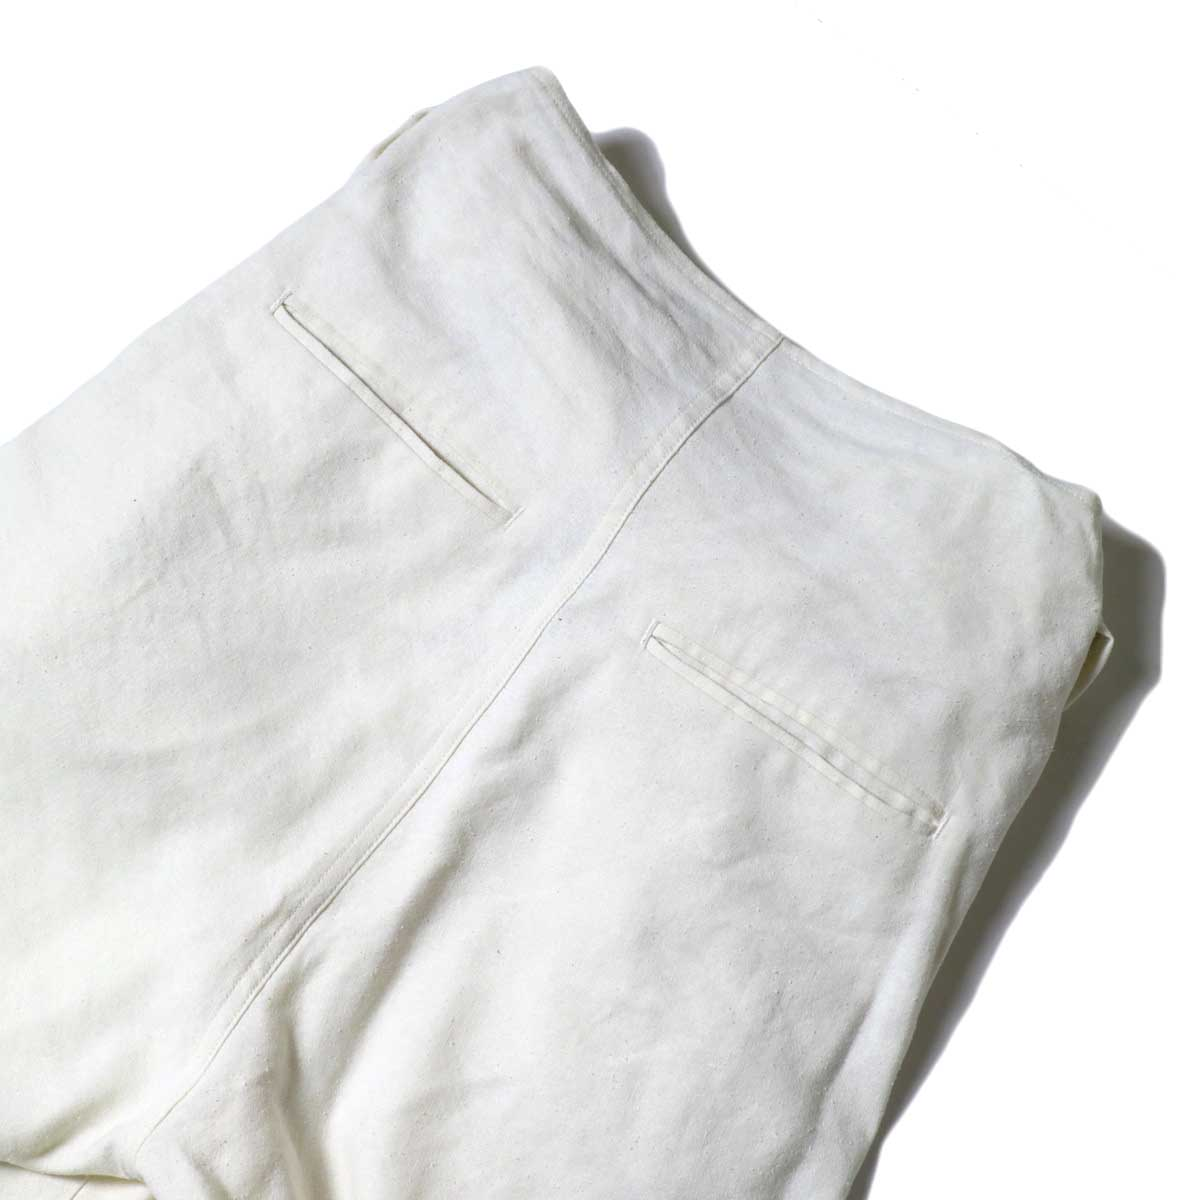 ARCHI / S/L NEP WRAP SLACKS (White) ウエスト背面②